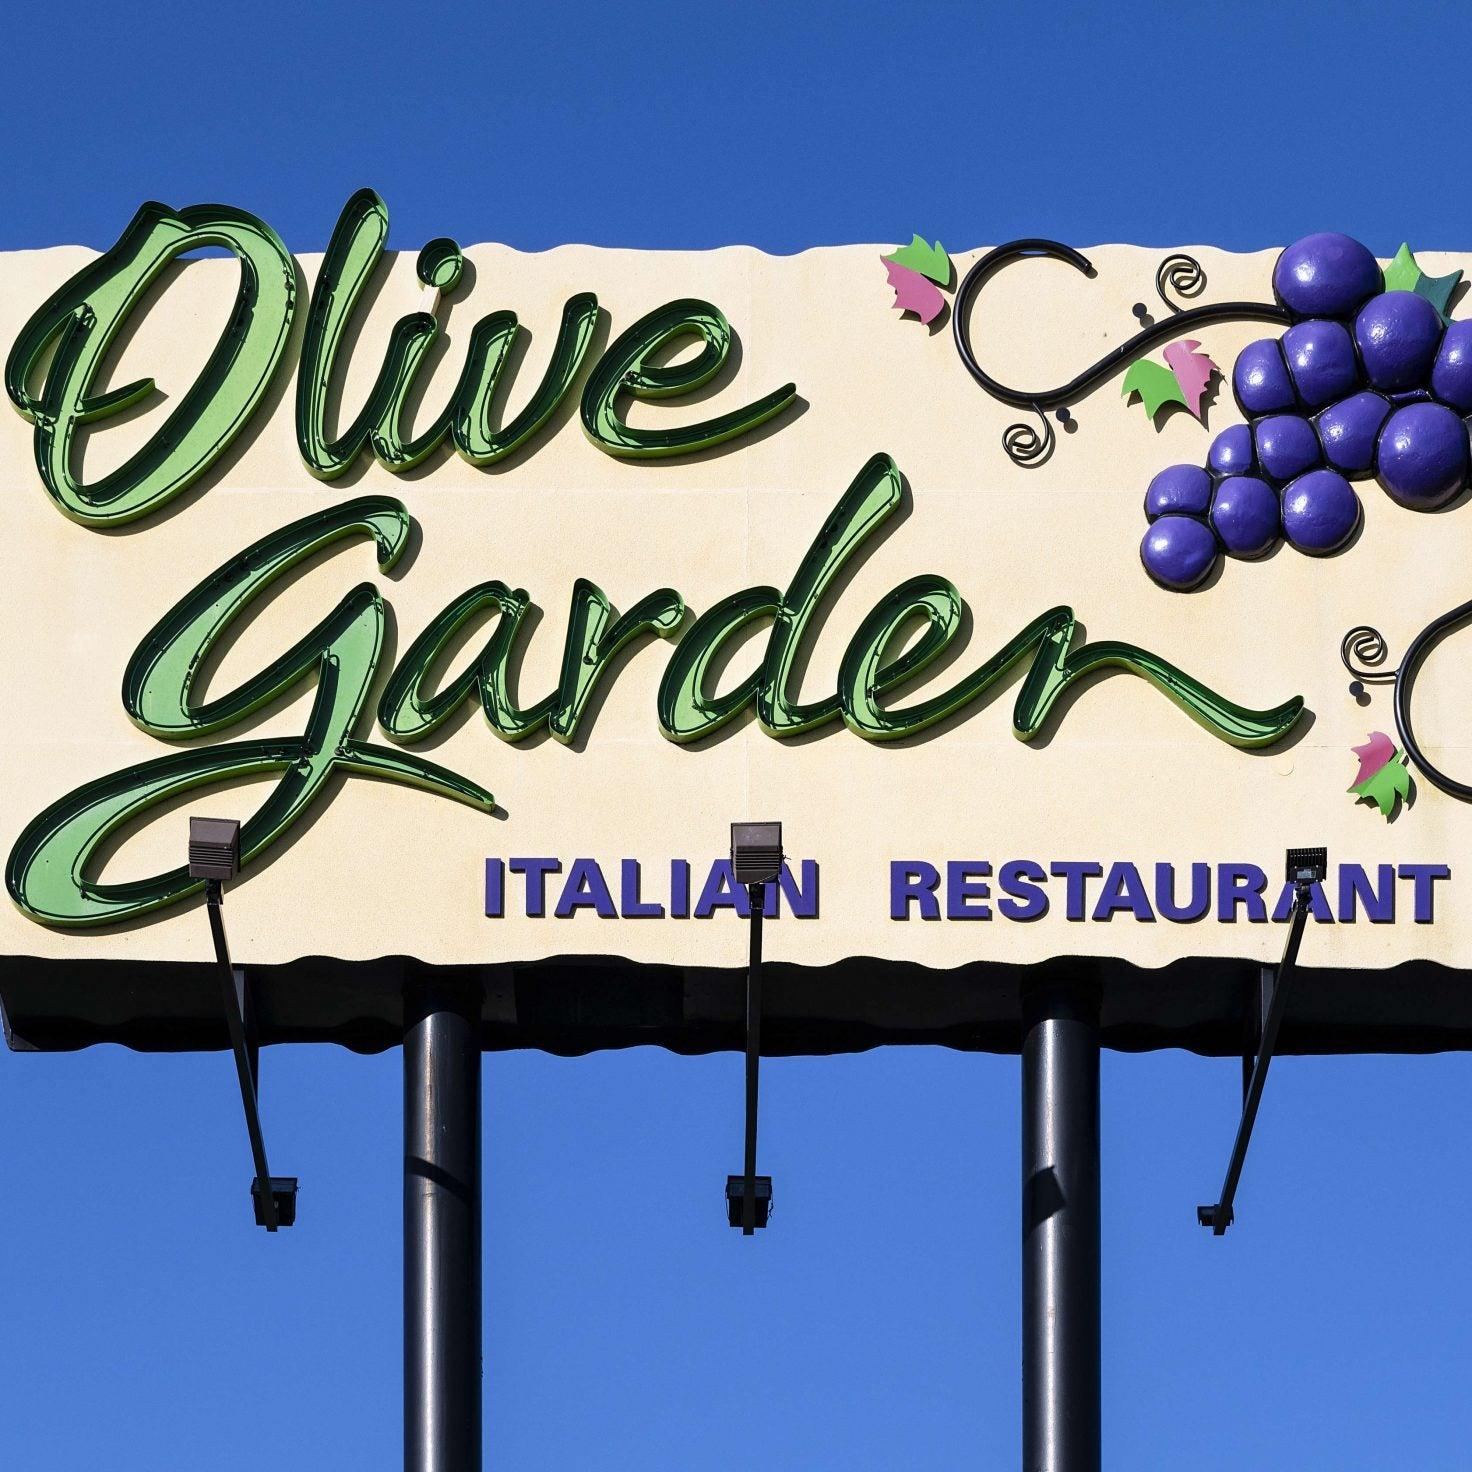 Olive Garden Employee To File Lawsuit After Customer Demanded Non-Black Server